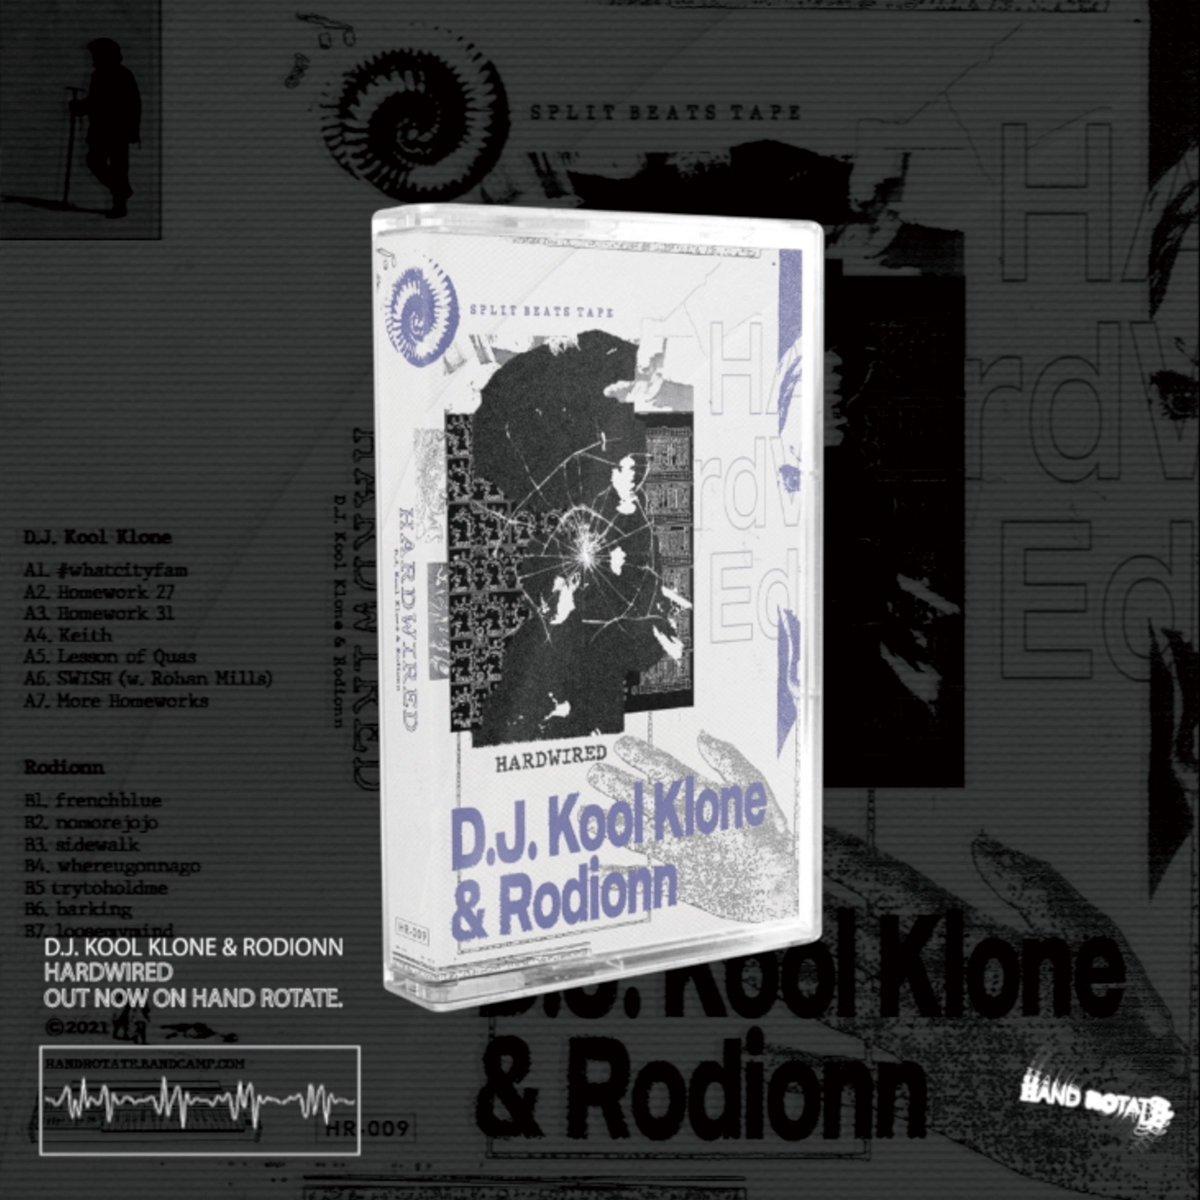 D.J.KOOL KLONE&Rodionn -Hardwired( Hand Rotate) Hip Hop